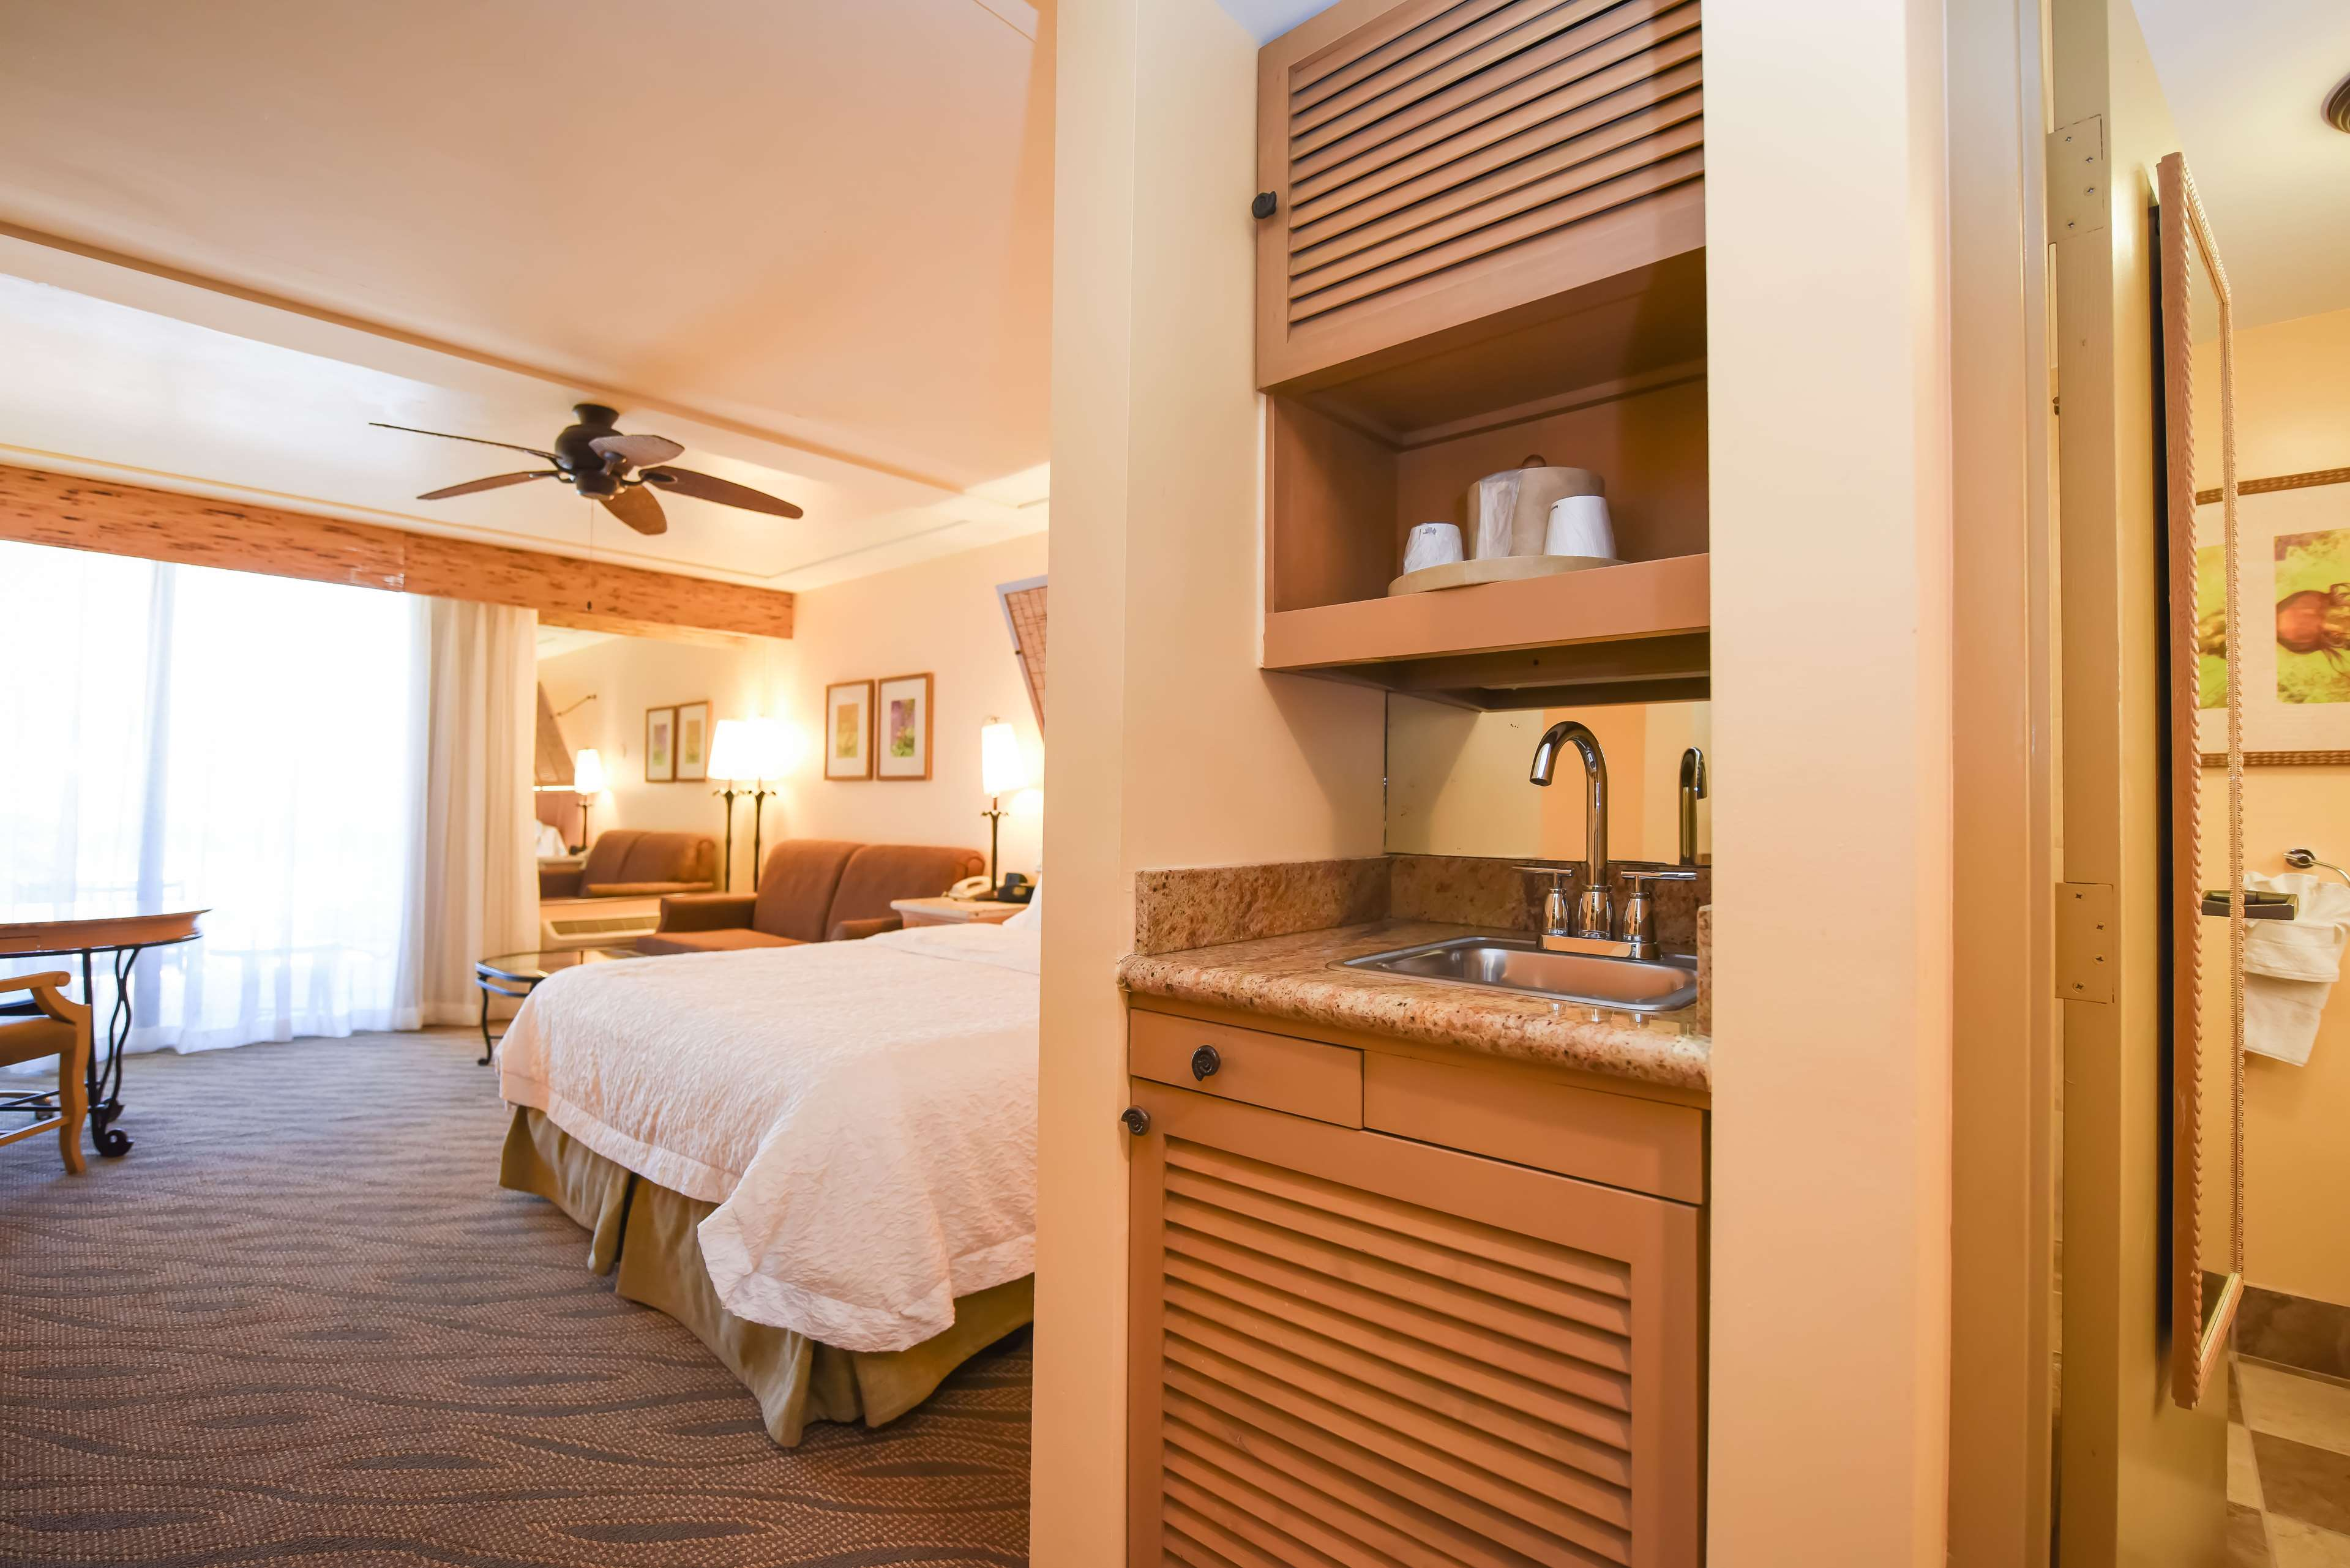 Hampton Inn Key Largo, FL image 28